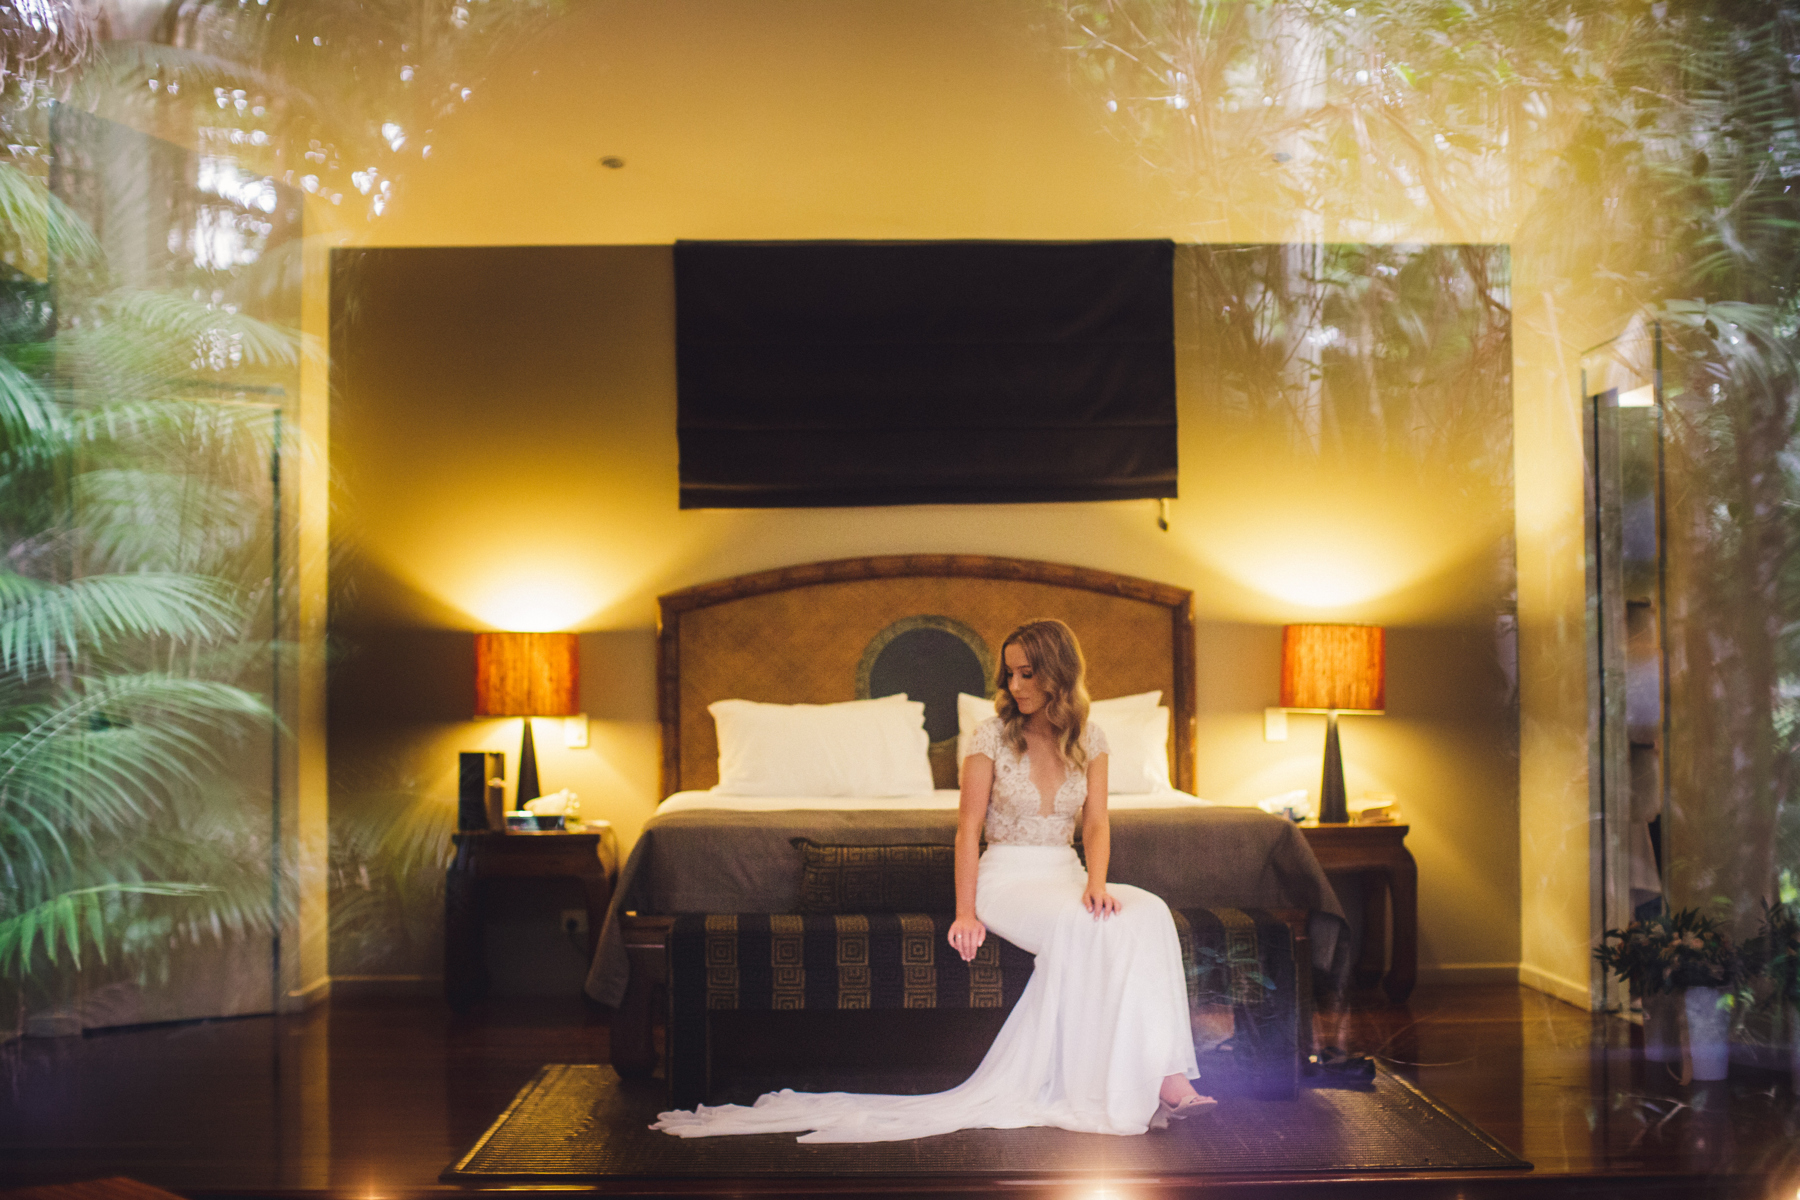 Pethers Wedding Photographer